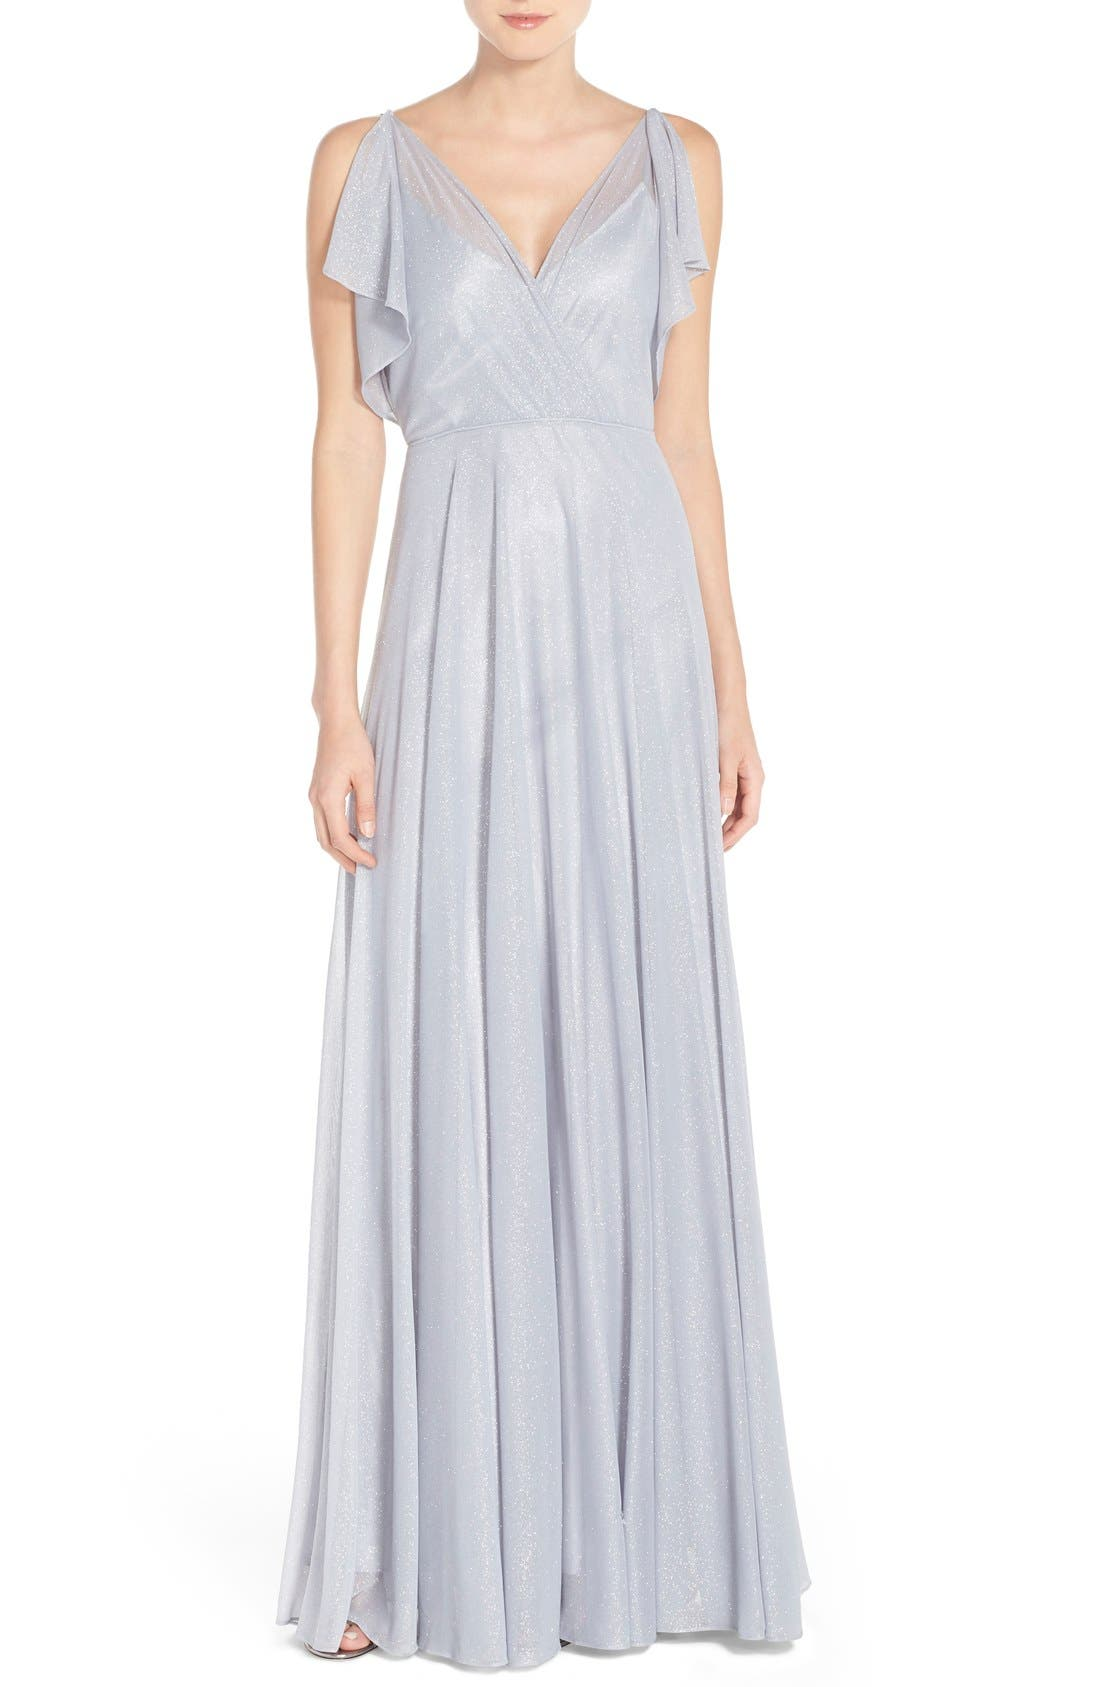 Main Image - Jenny Yoo 'Cassie' V-Neck Flutter Sleeve Shimmer Gown